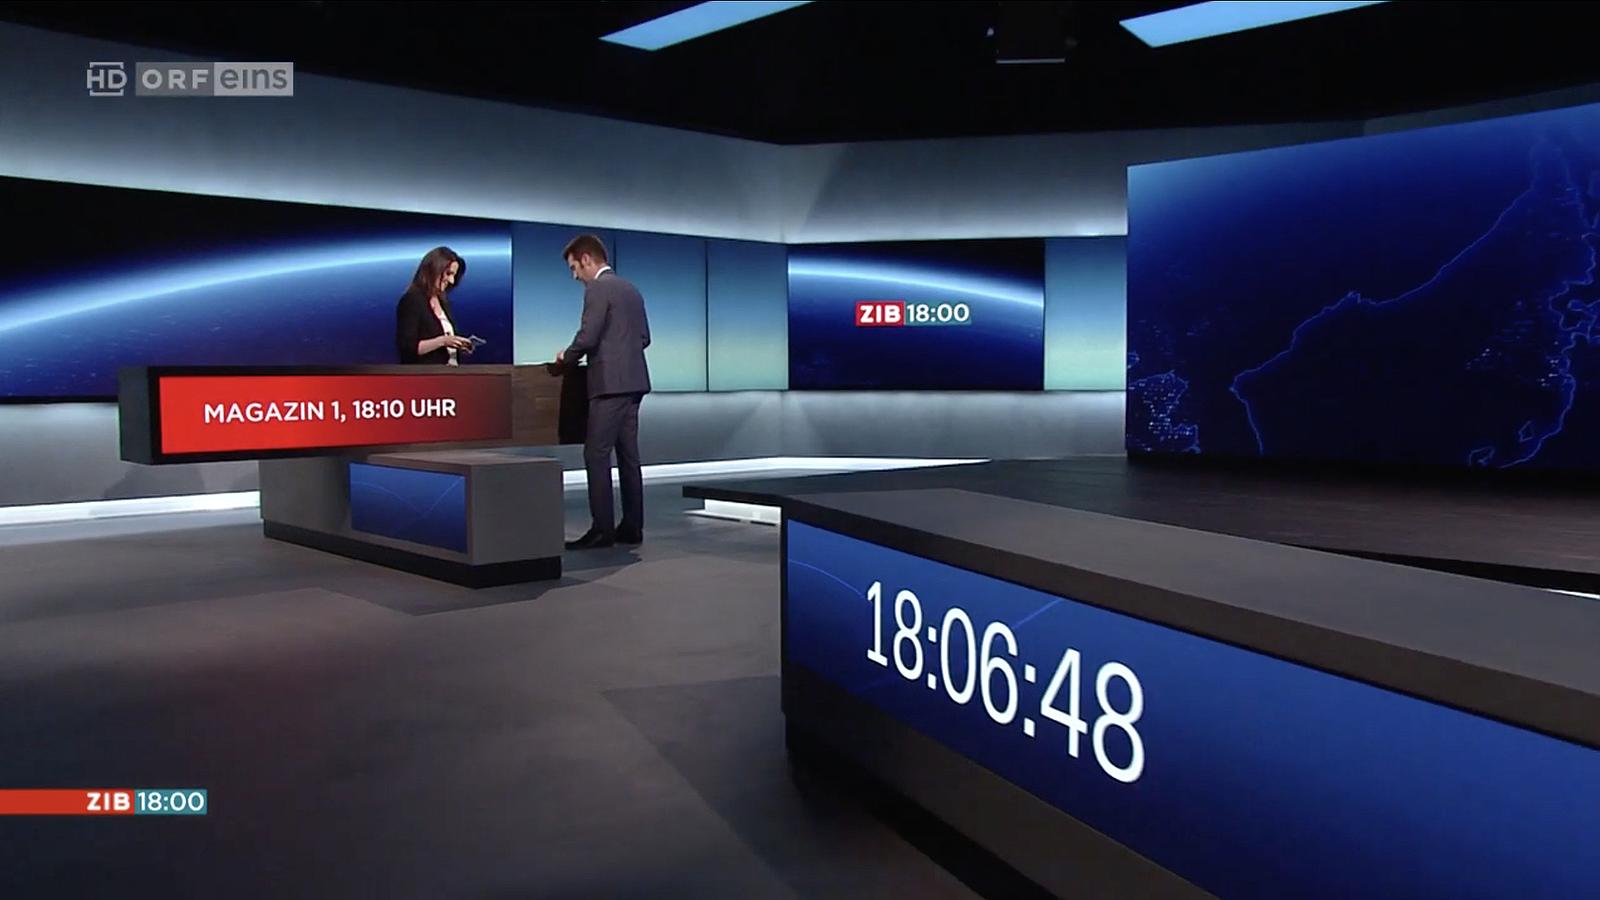 NCS_ORF-Veech-2019_0008